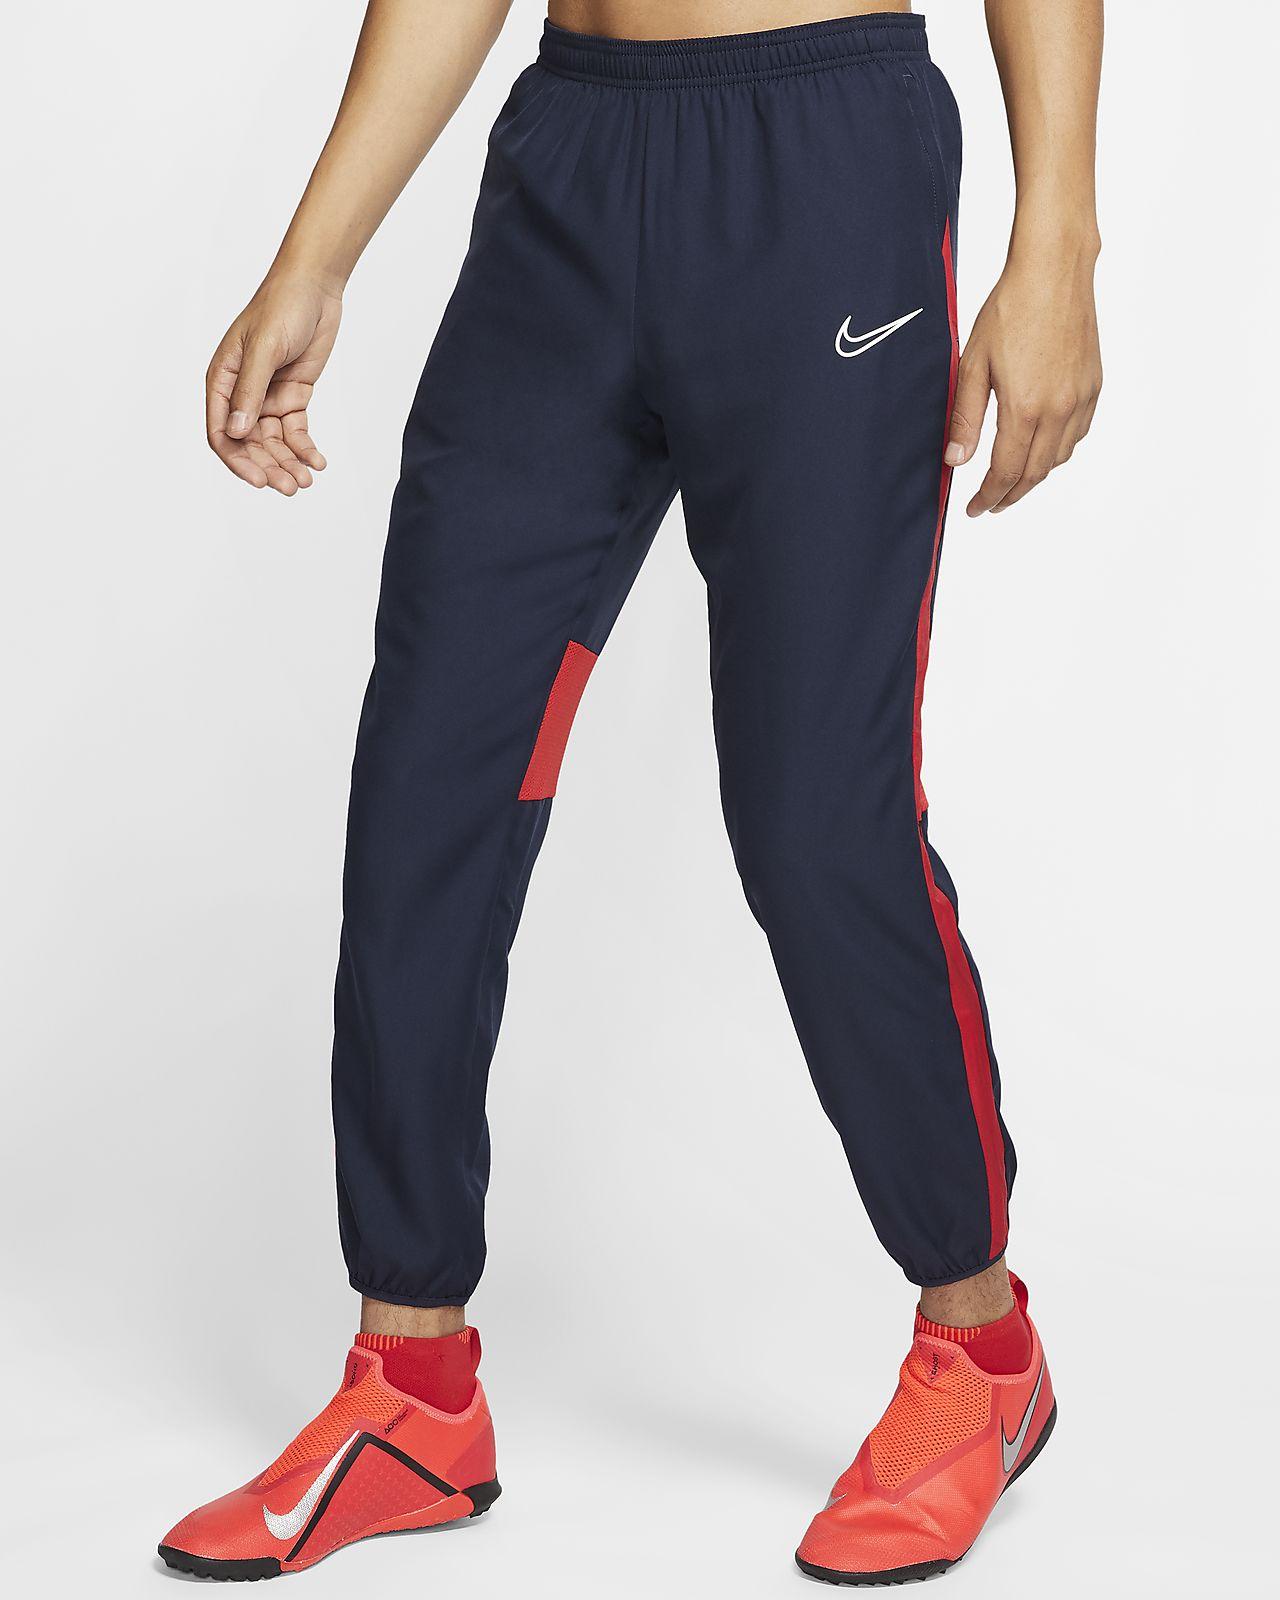 Nike Dri FIT Academy fotballbukse til herre. Nike NO